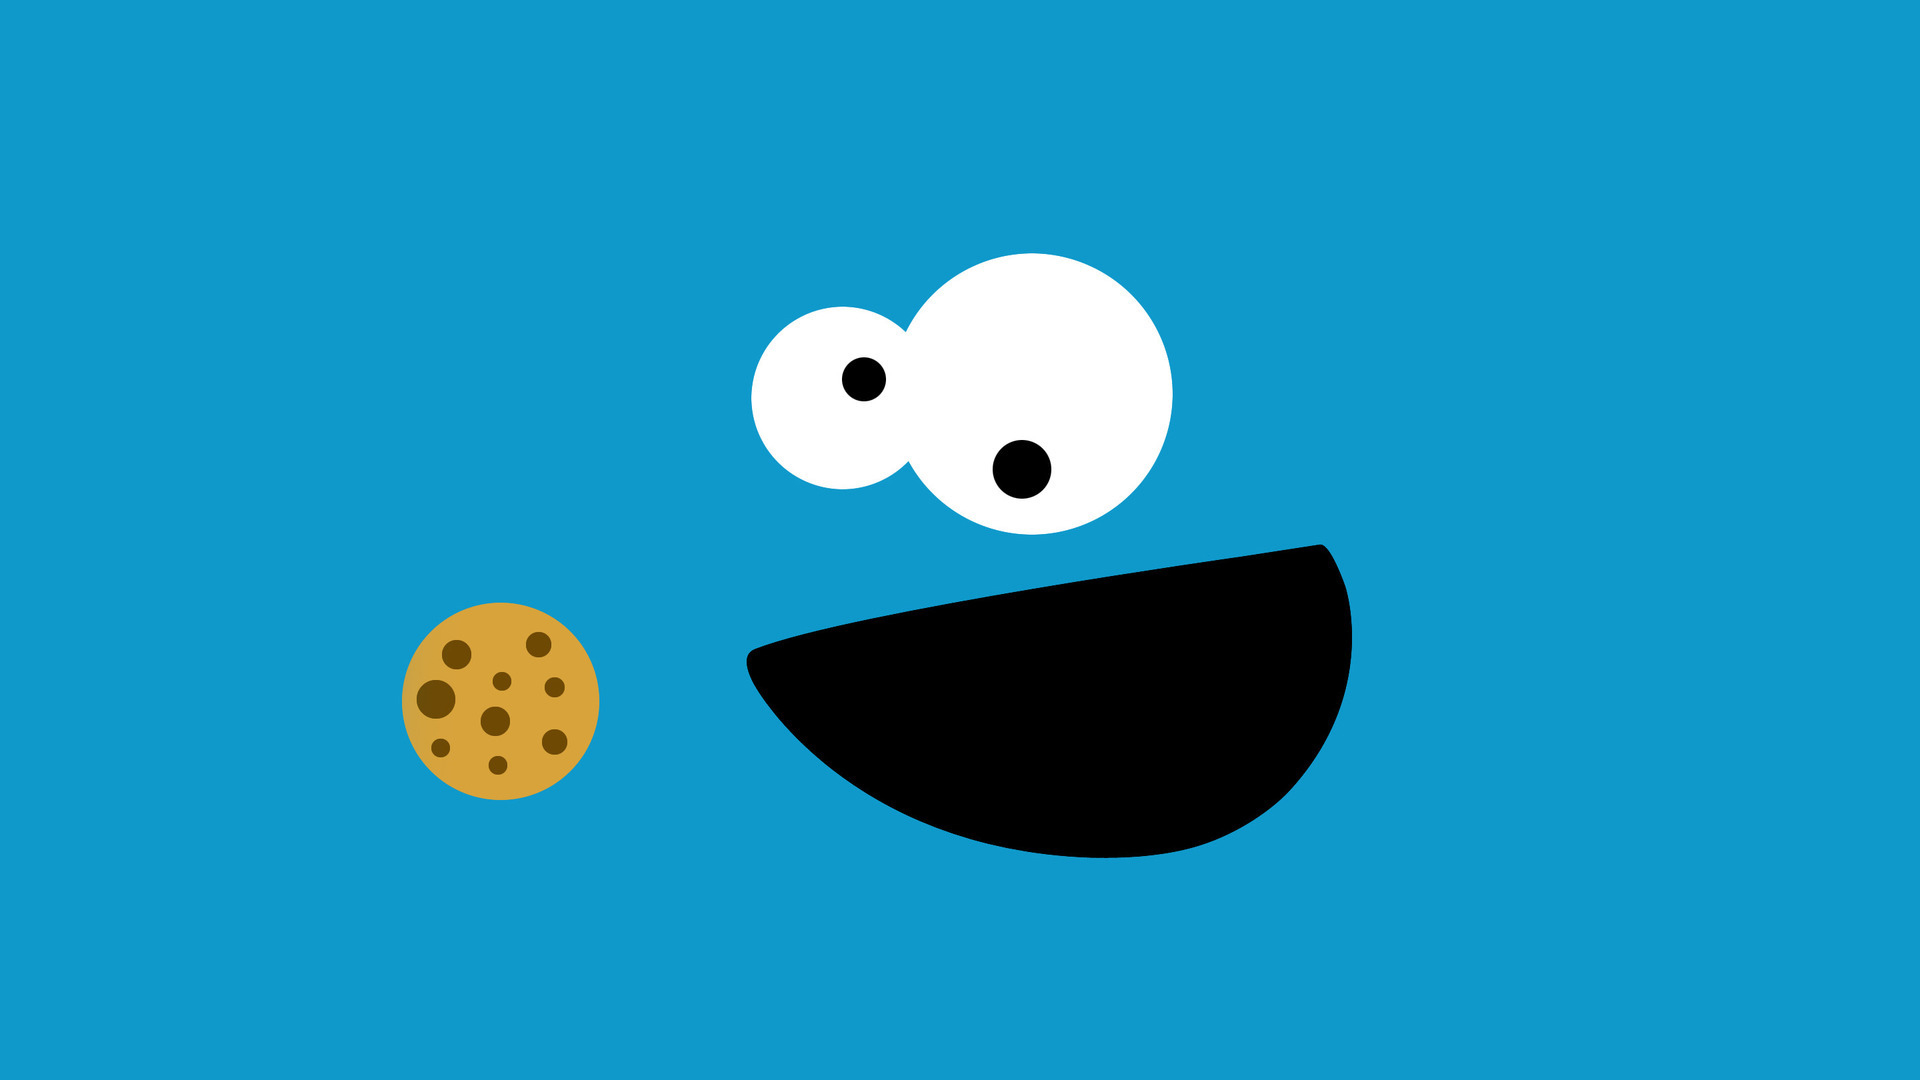 Cute Cookie Monster Wallpaper Free Desktop Cookie Monster Hd Wallpapers Pixelstalk Net